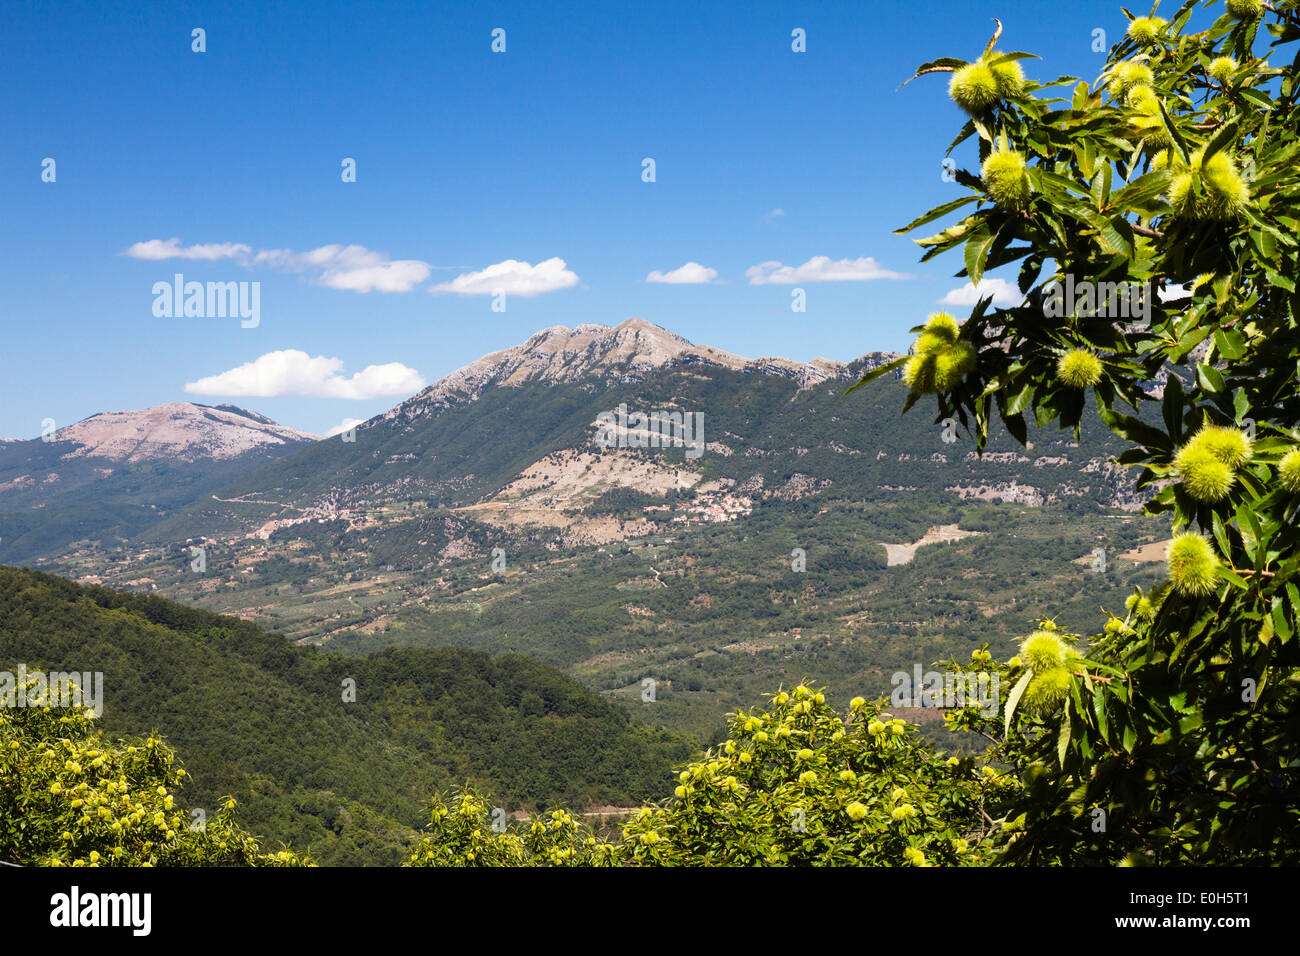 Bergpanorama mit Kastanien-Baum, Castanea Sativa, Cilento Nationalpark Cilento, Kampanien, Süditalien, Europa Stockbild